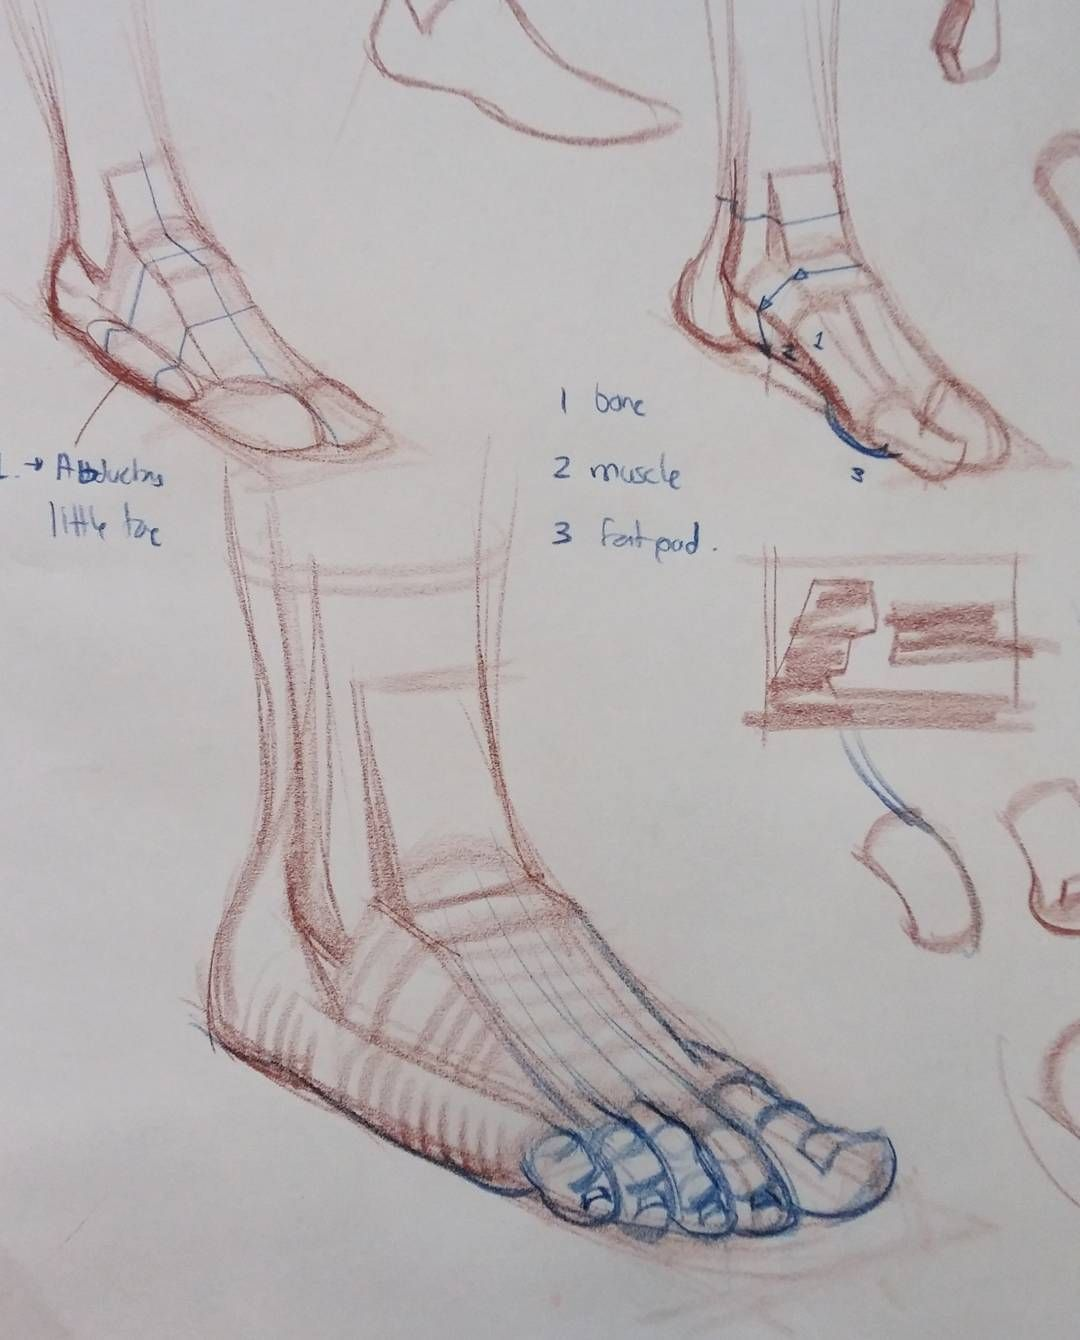 More demos afoot #art #figure #drawing #anatomy #anatomydrawing ...